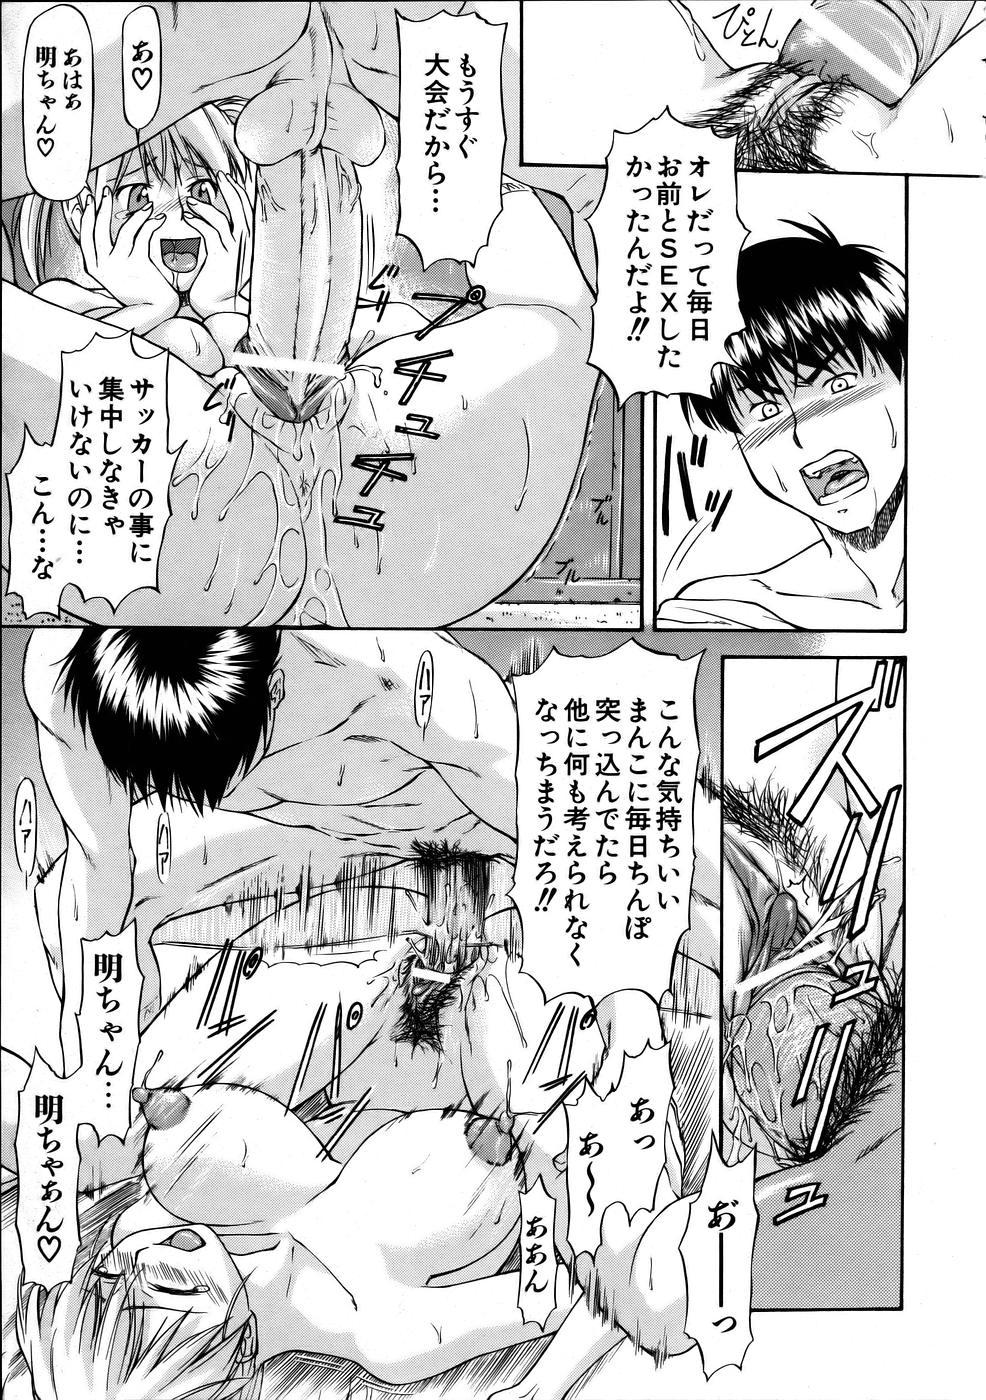 COMIC AUN 2005-10 Vol. 113 100